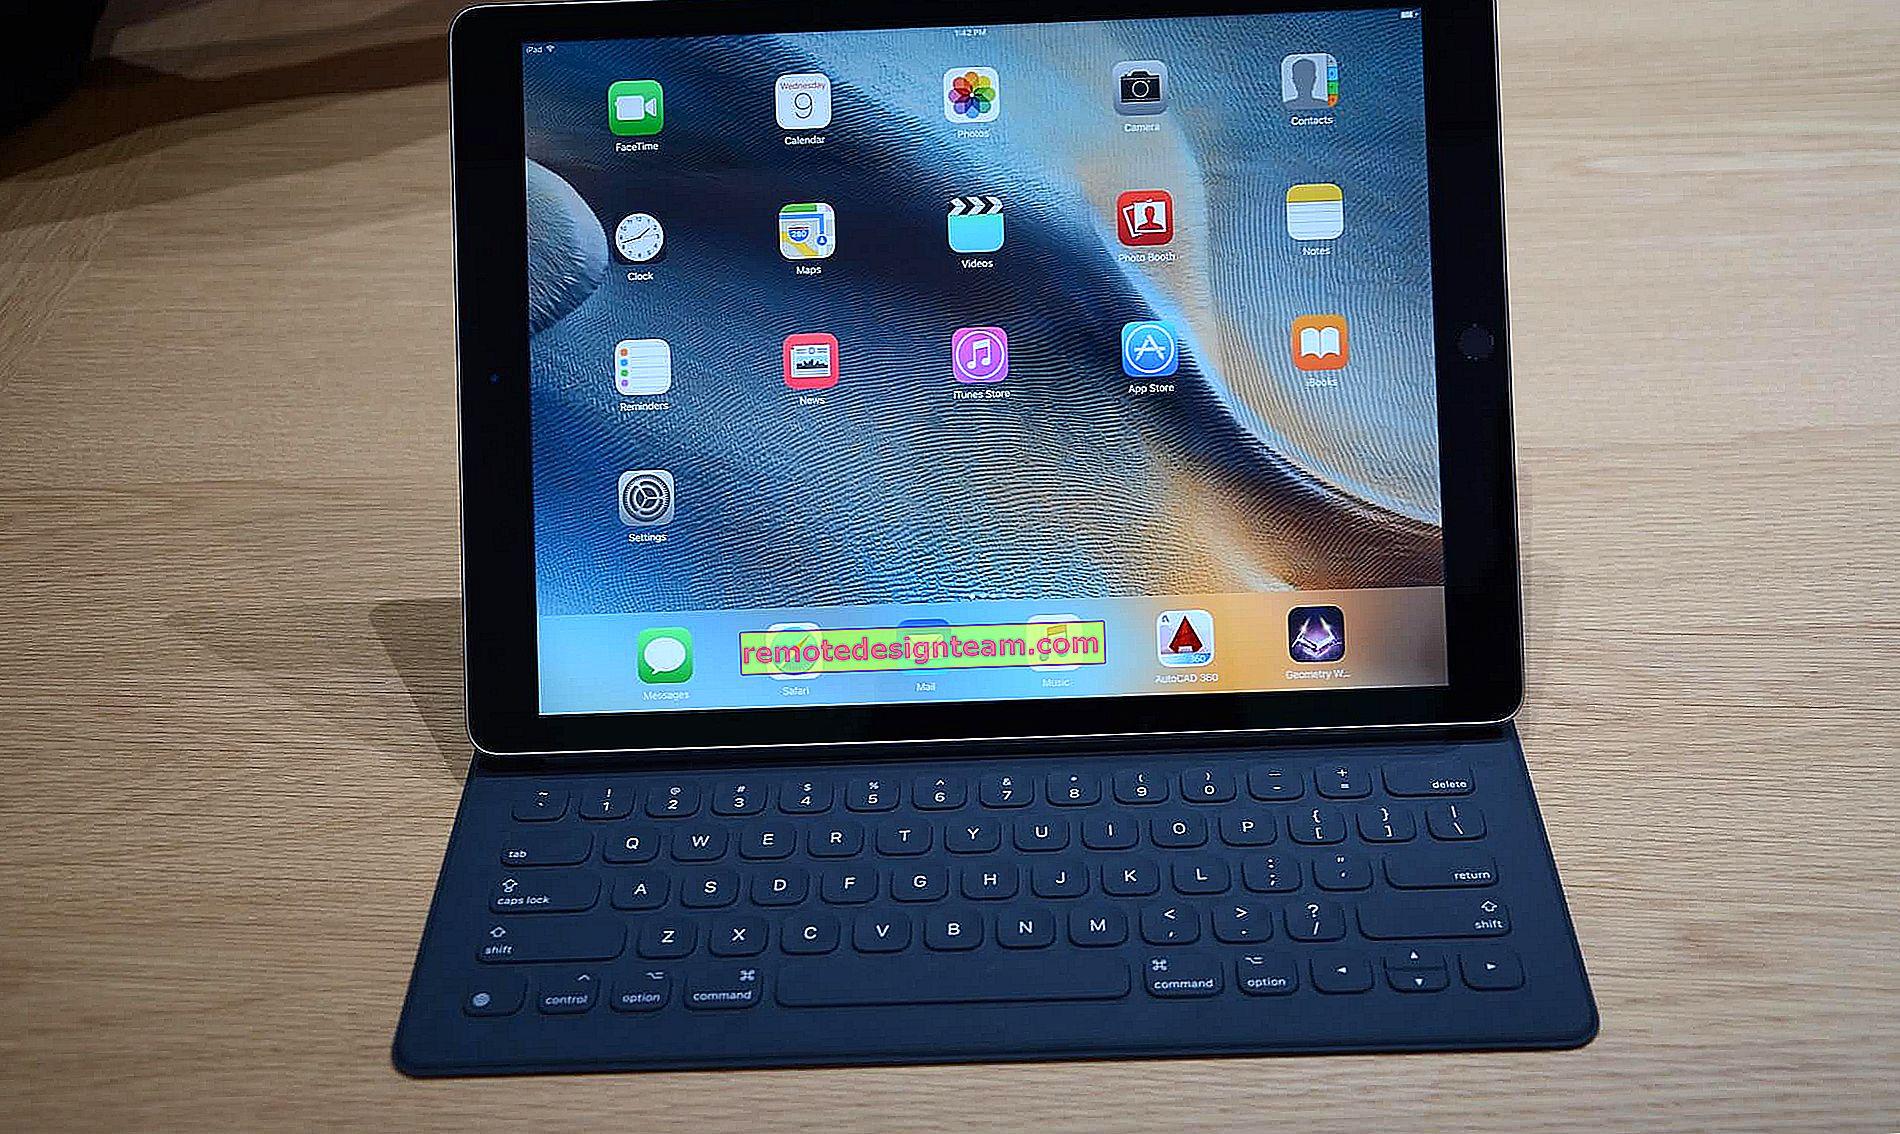 Как да огледате екрана на iPhone или iPad на телевизор?